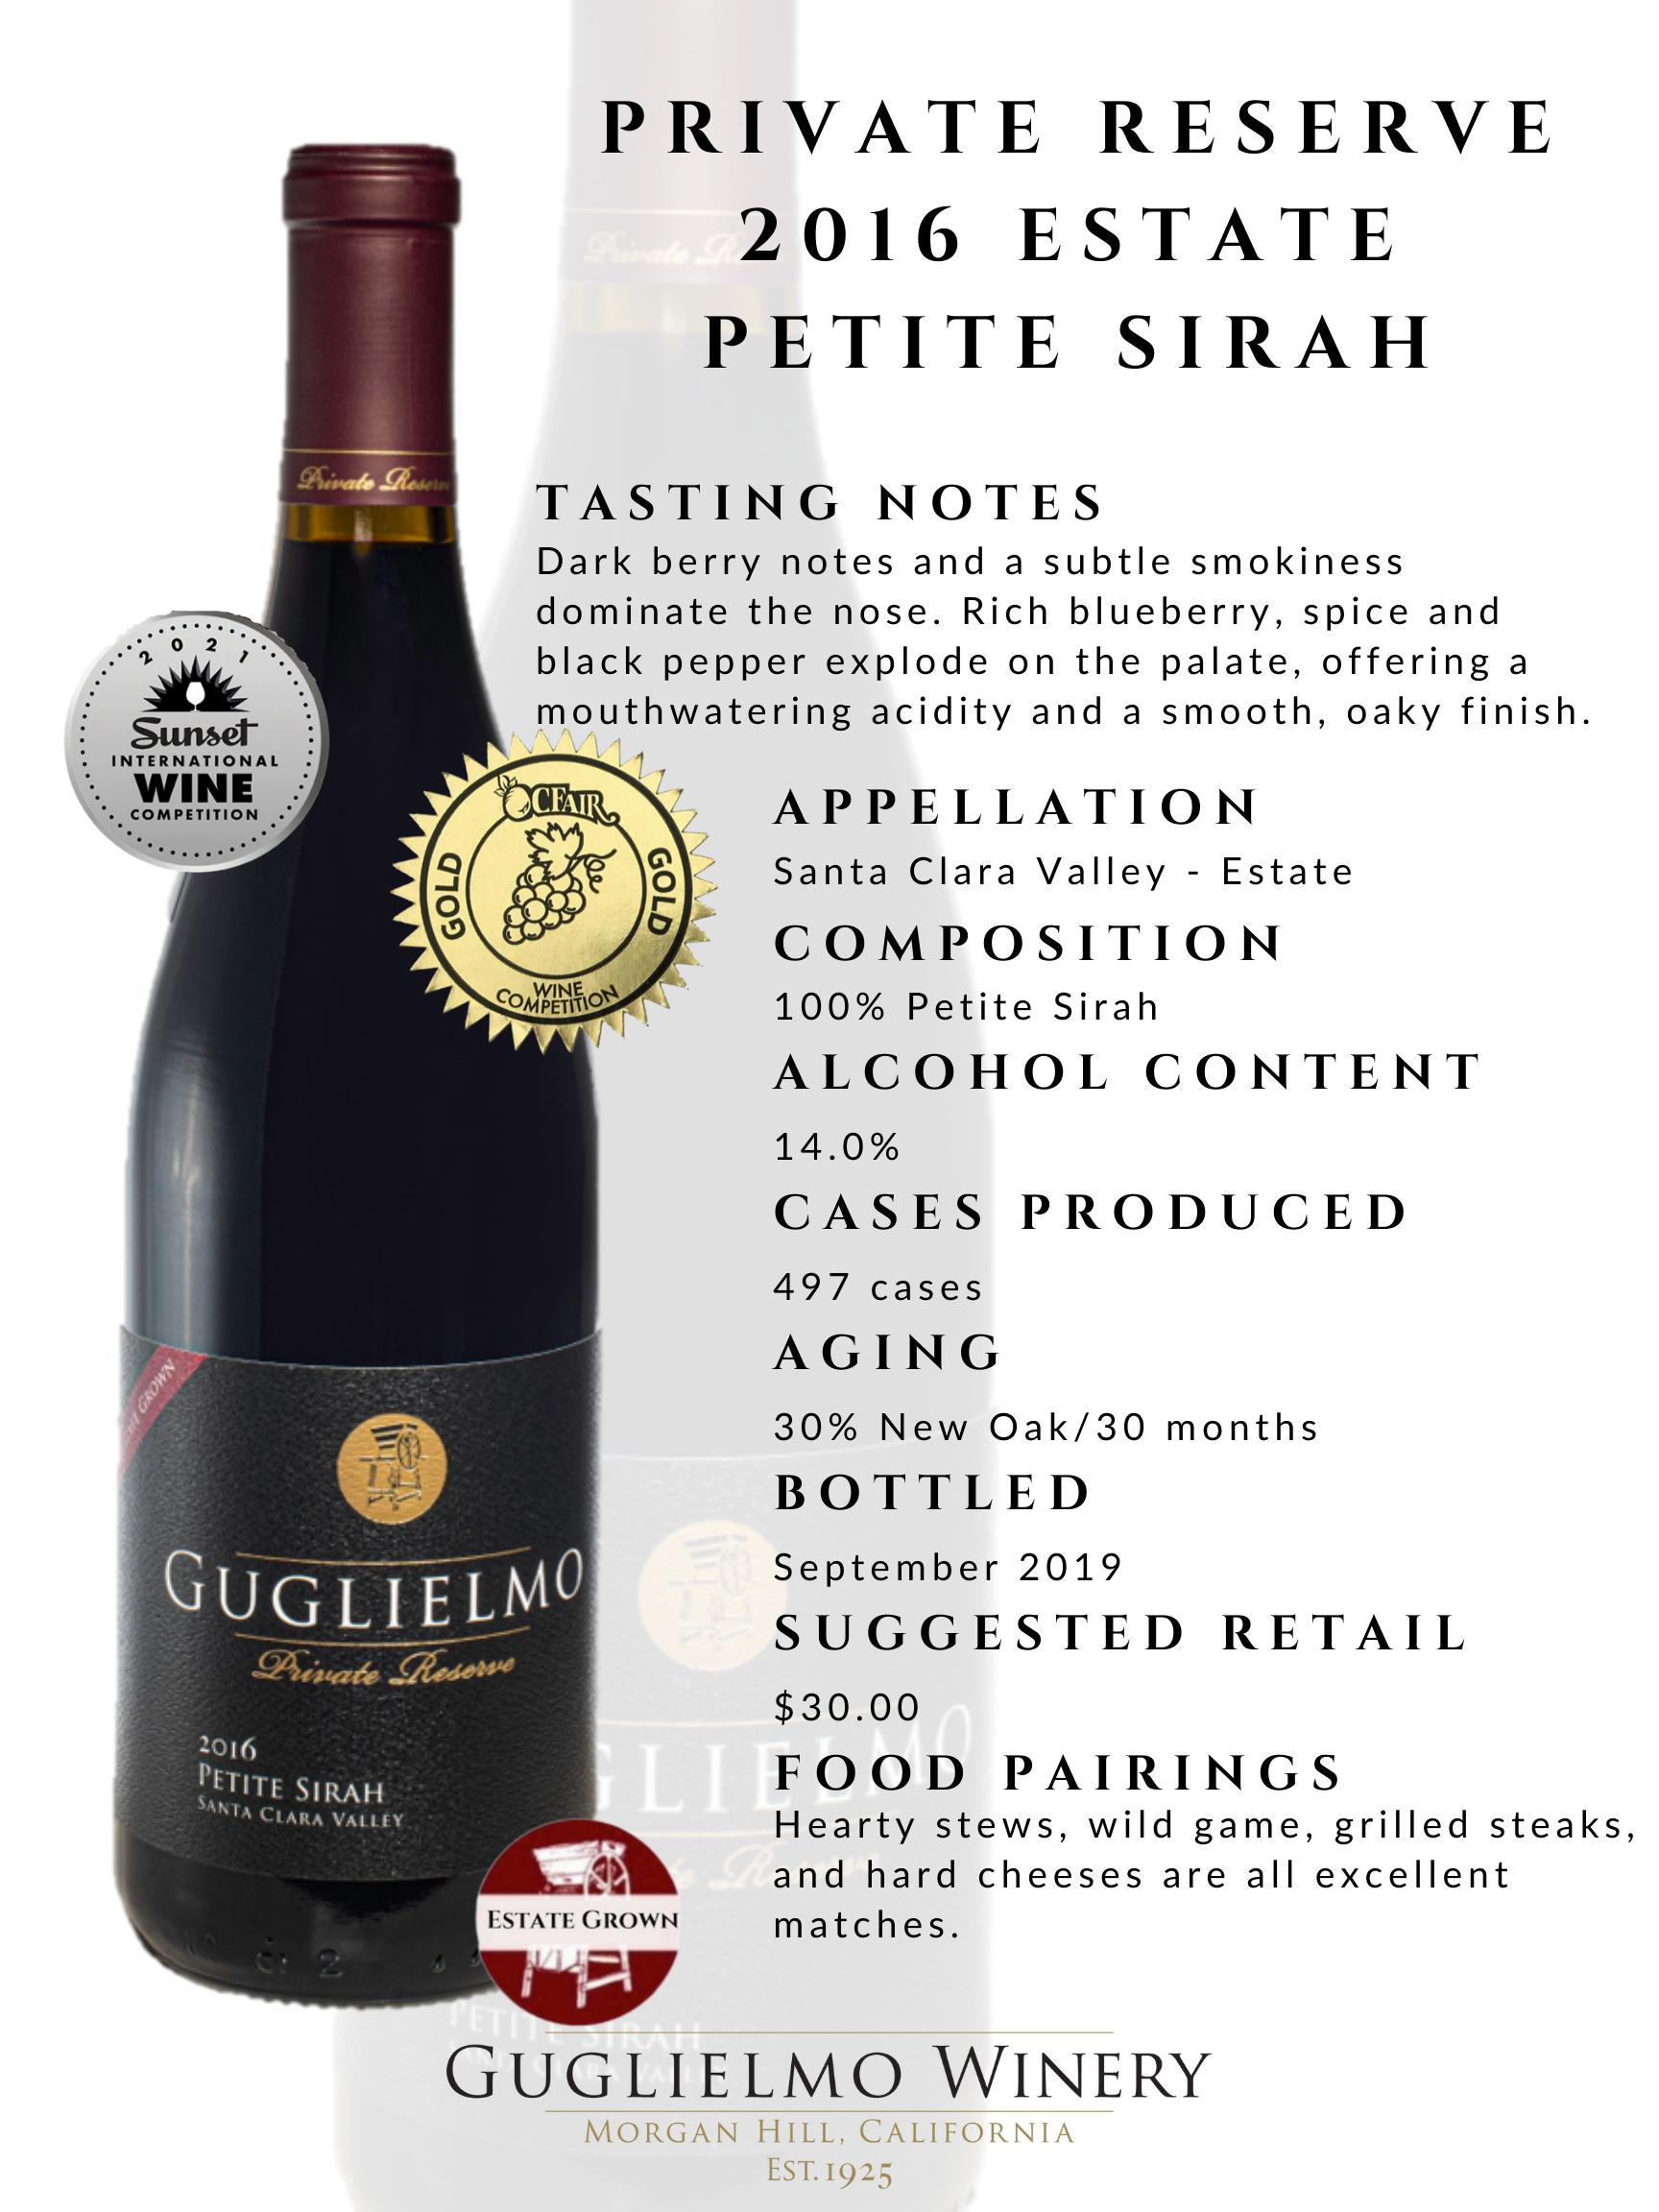 Private Reserve Petite Sirah 2016 Fact Sheet